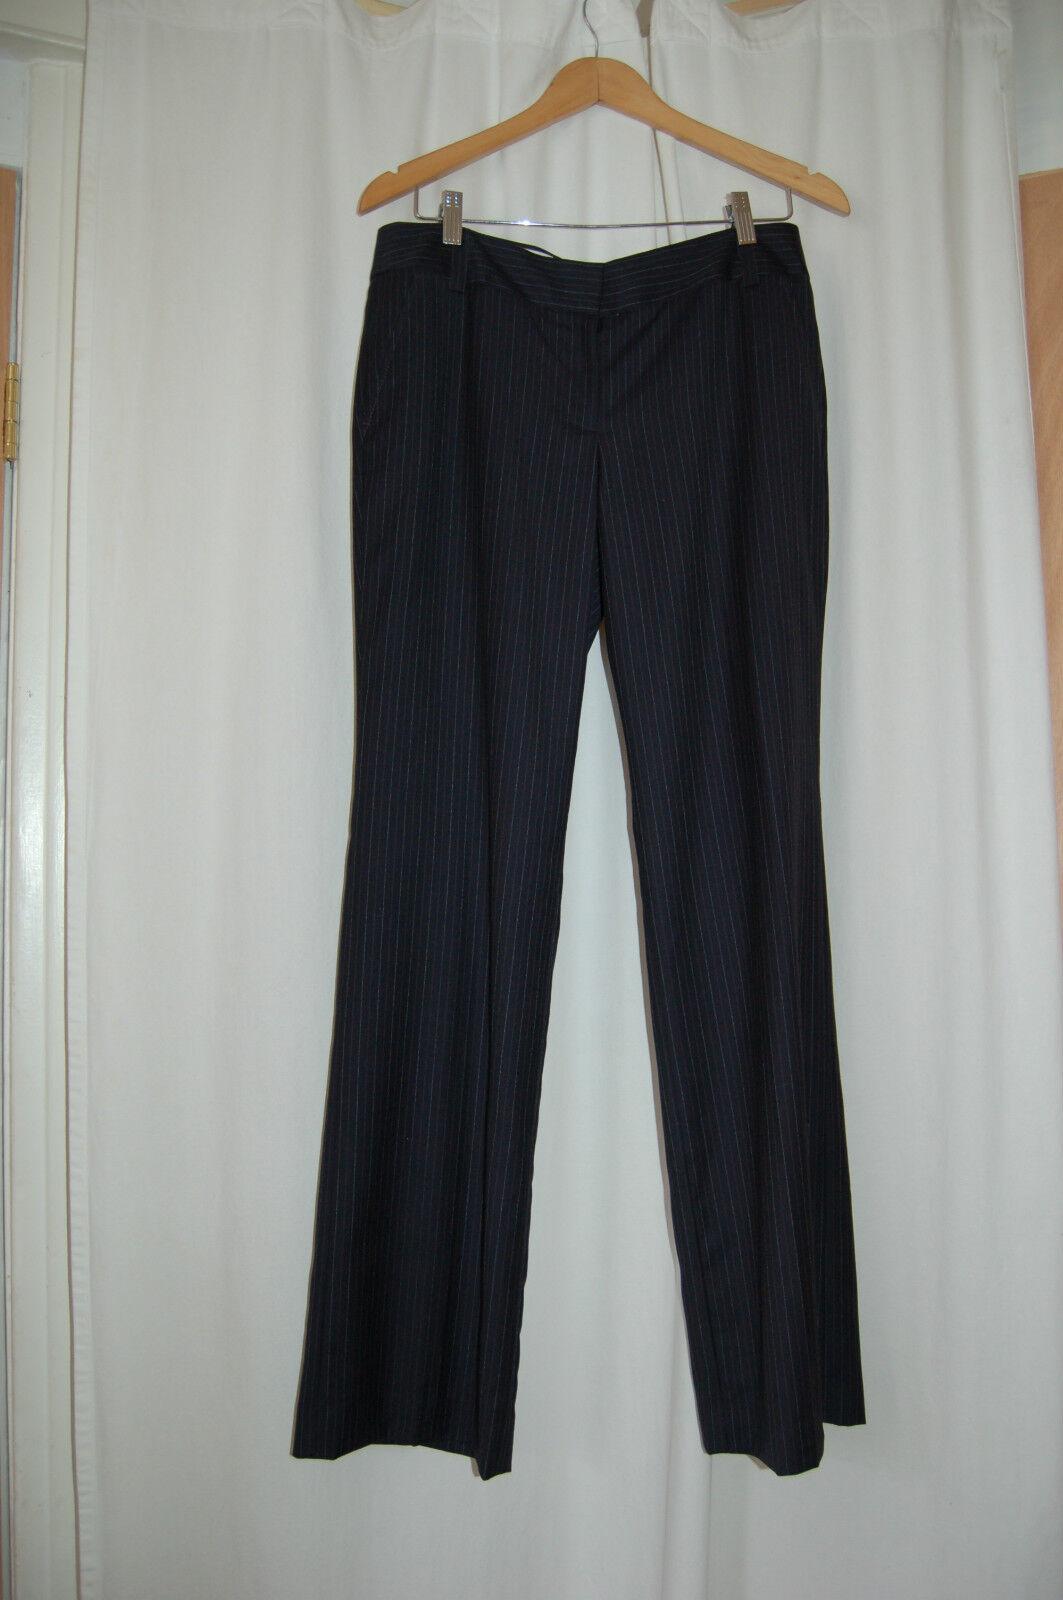 J.  Crew Favorite Fit Wool Navy bluee  Pin Striped Pants Size 8